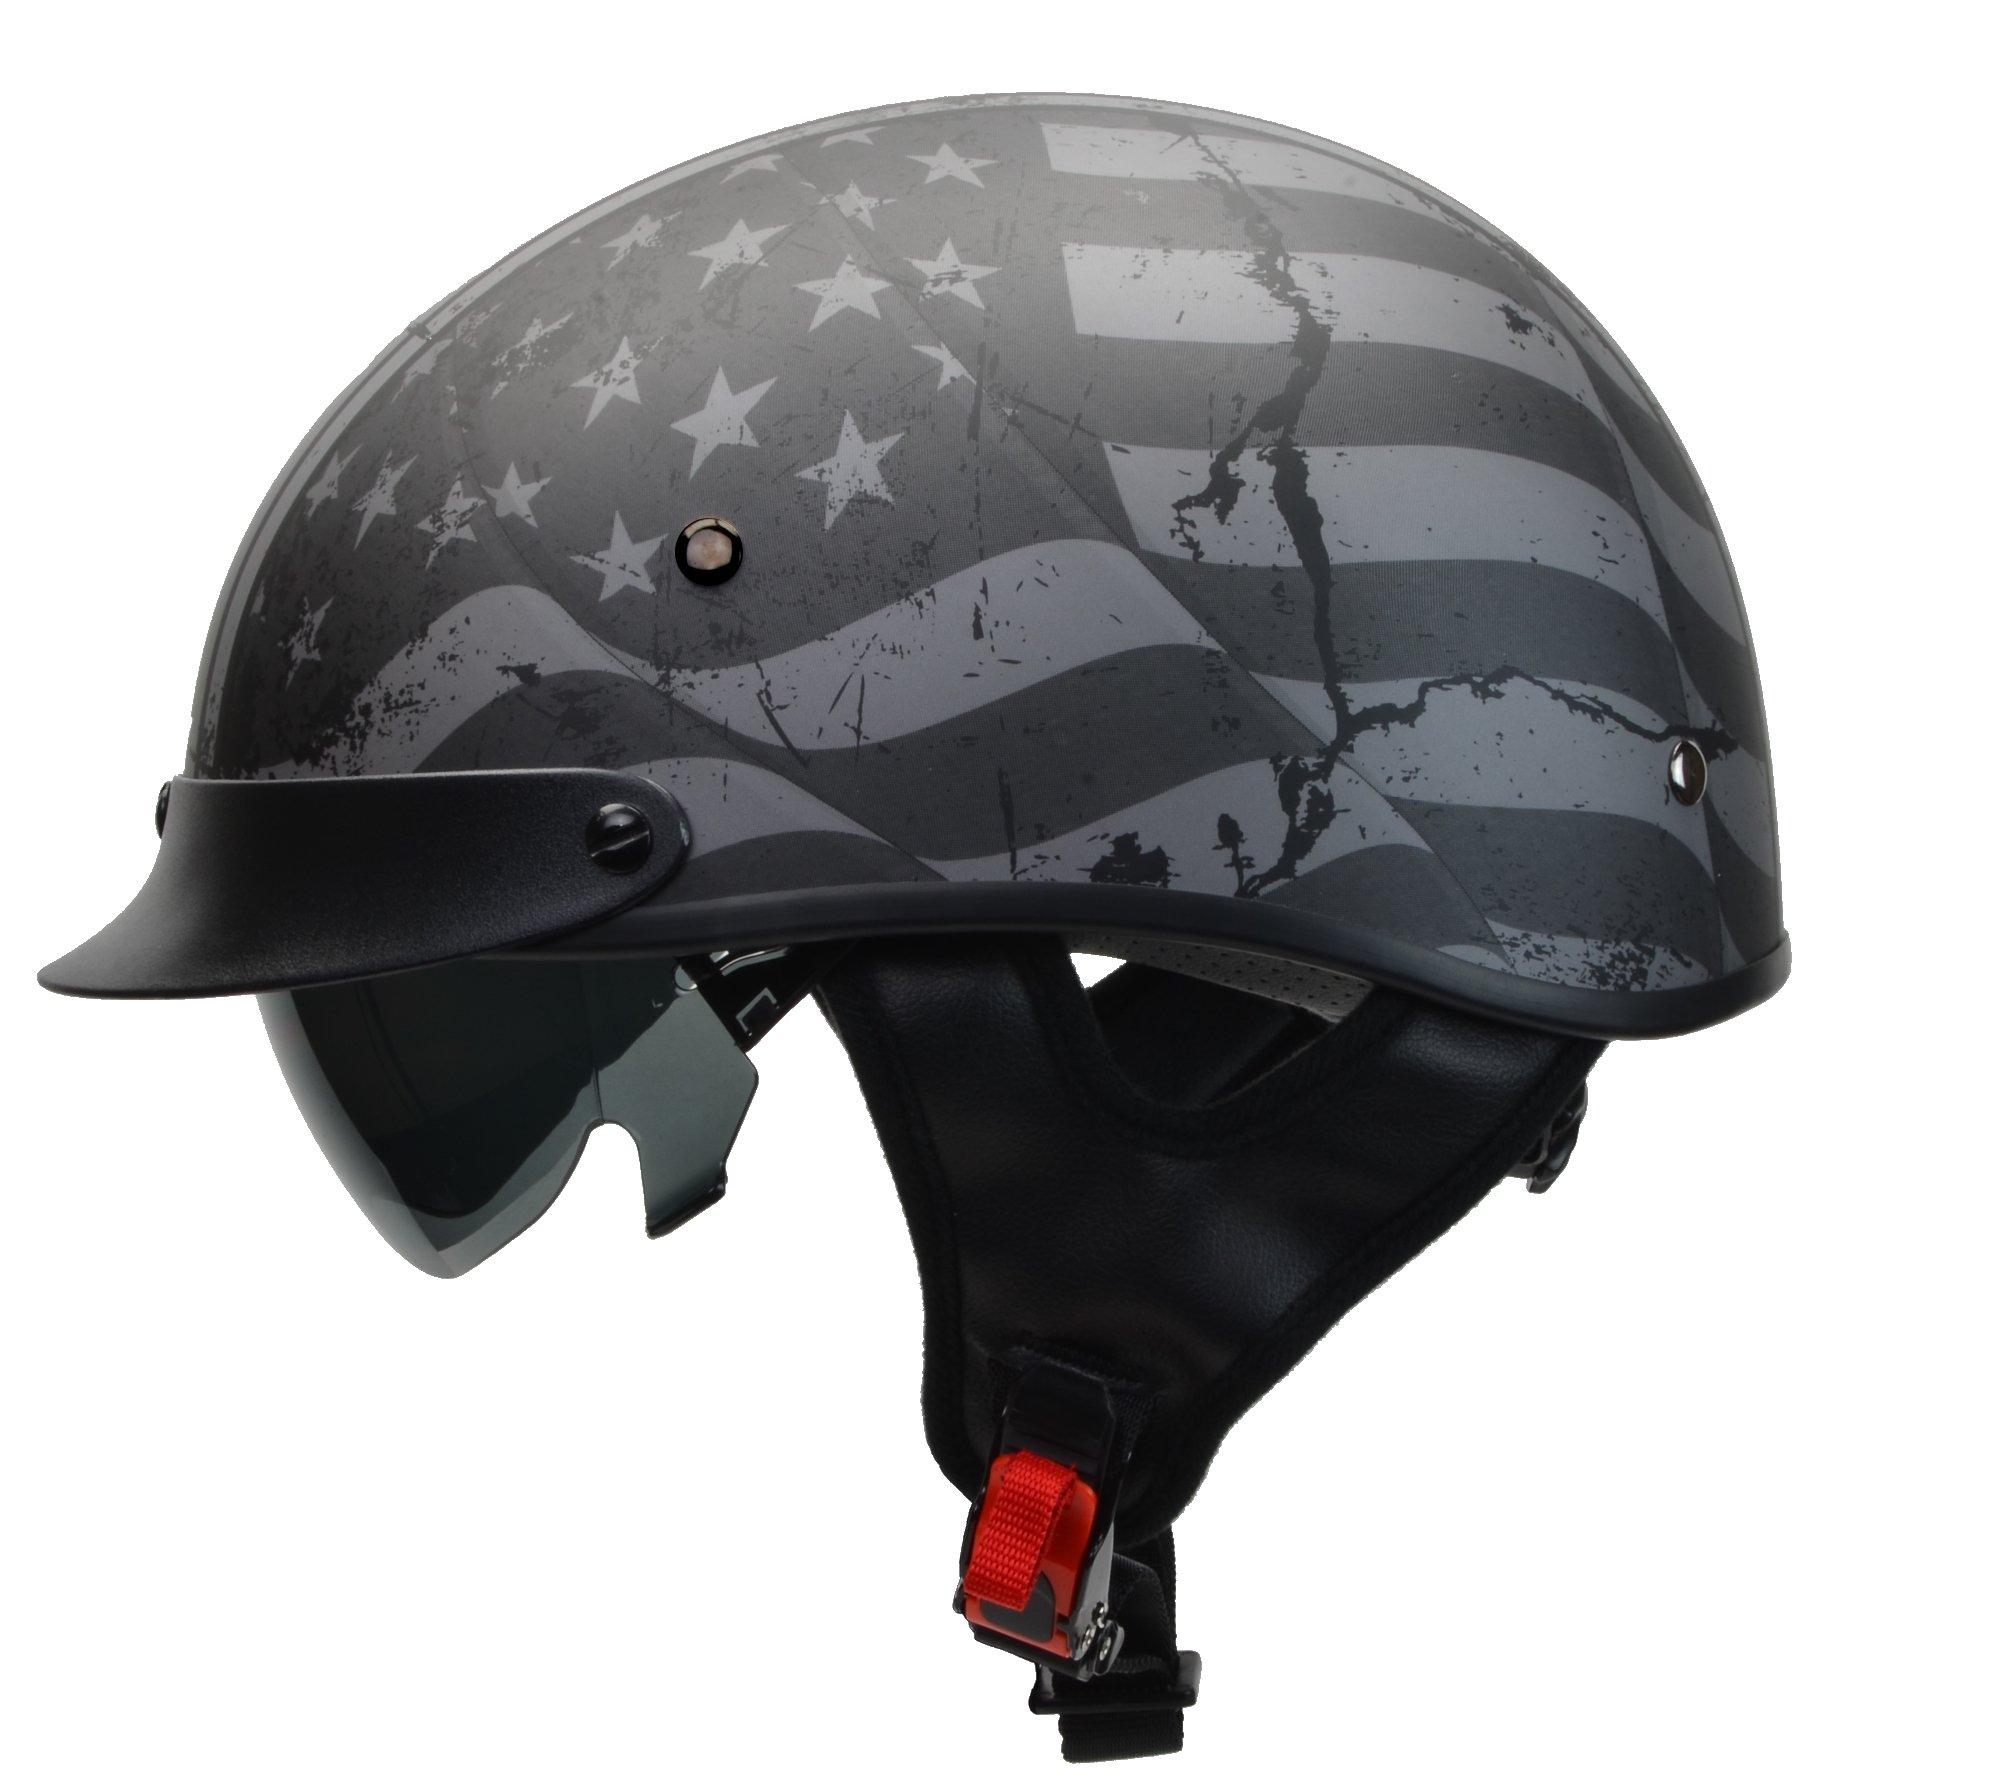 Vega Helmets Warrior Motorcycle Half Helmet with Sunshield for Men & Women, Adjustable Size Dial DOT Half Face Skull Cap for Bike Cruiser Chopper Moped Scooter ATV (Medium, Patriotic Flag Graphic) by Vega Helmets (Image #7)